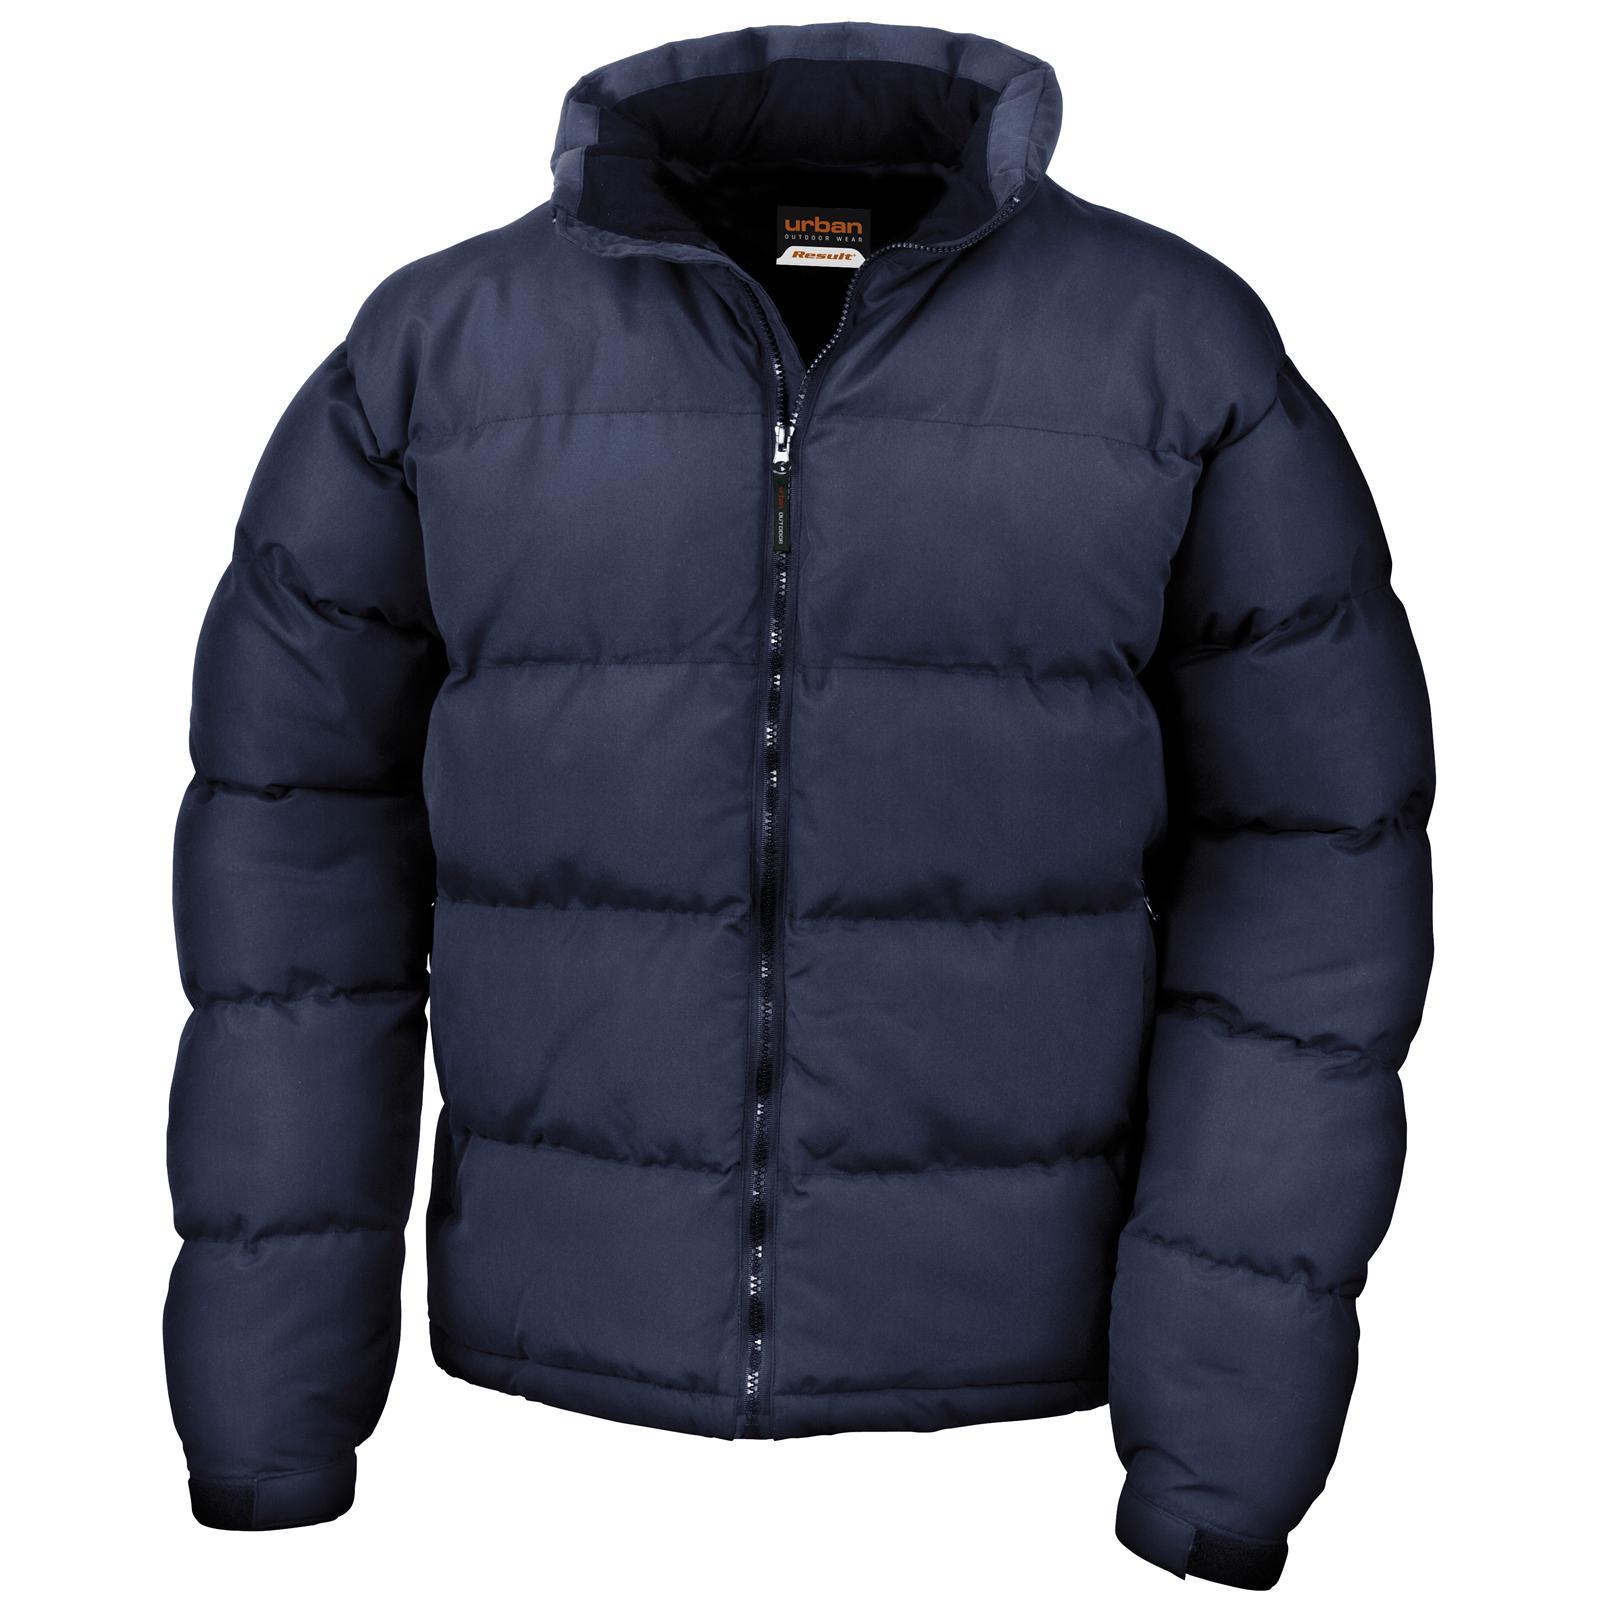 Result Mens Urban Holkham Down Feel Puffer Jacket in Black Navy S ... 803b77e41ab7